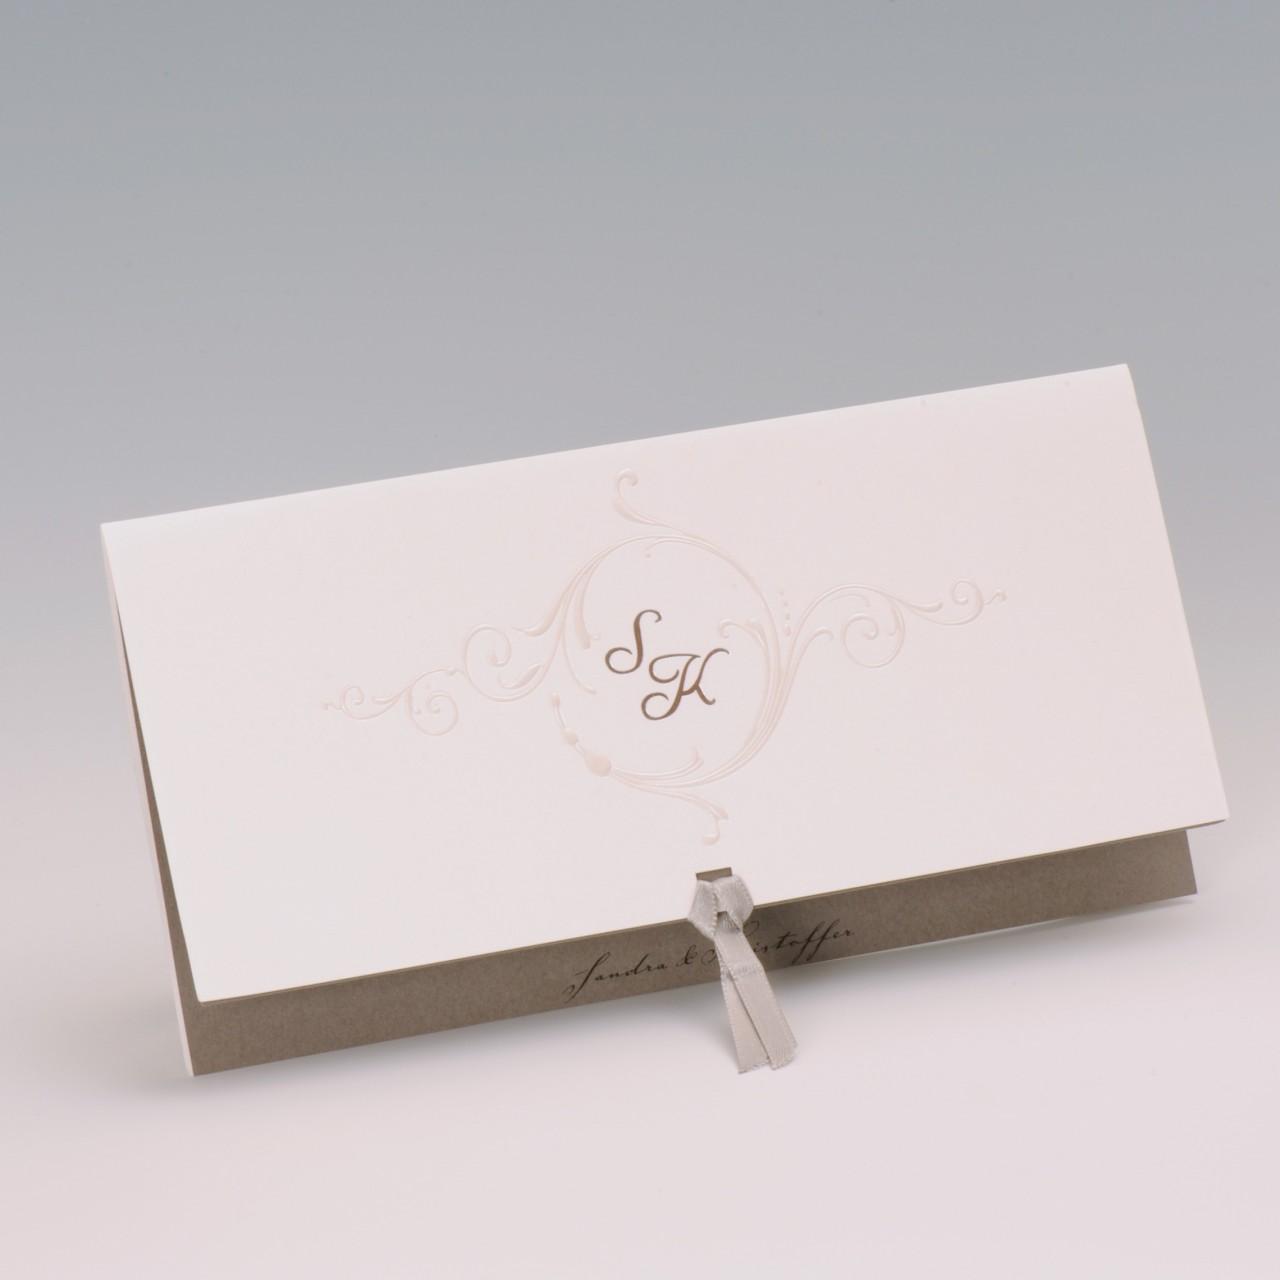 Einladungskarte - H 1944